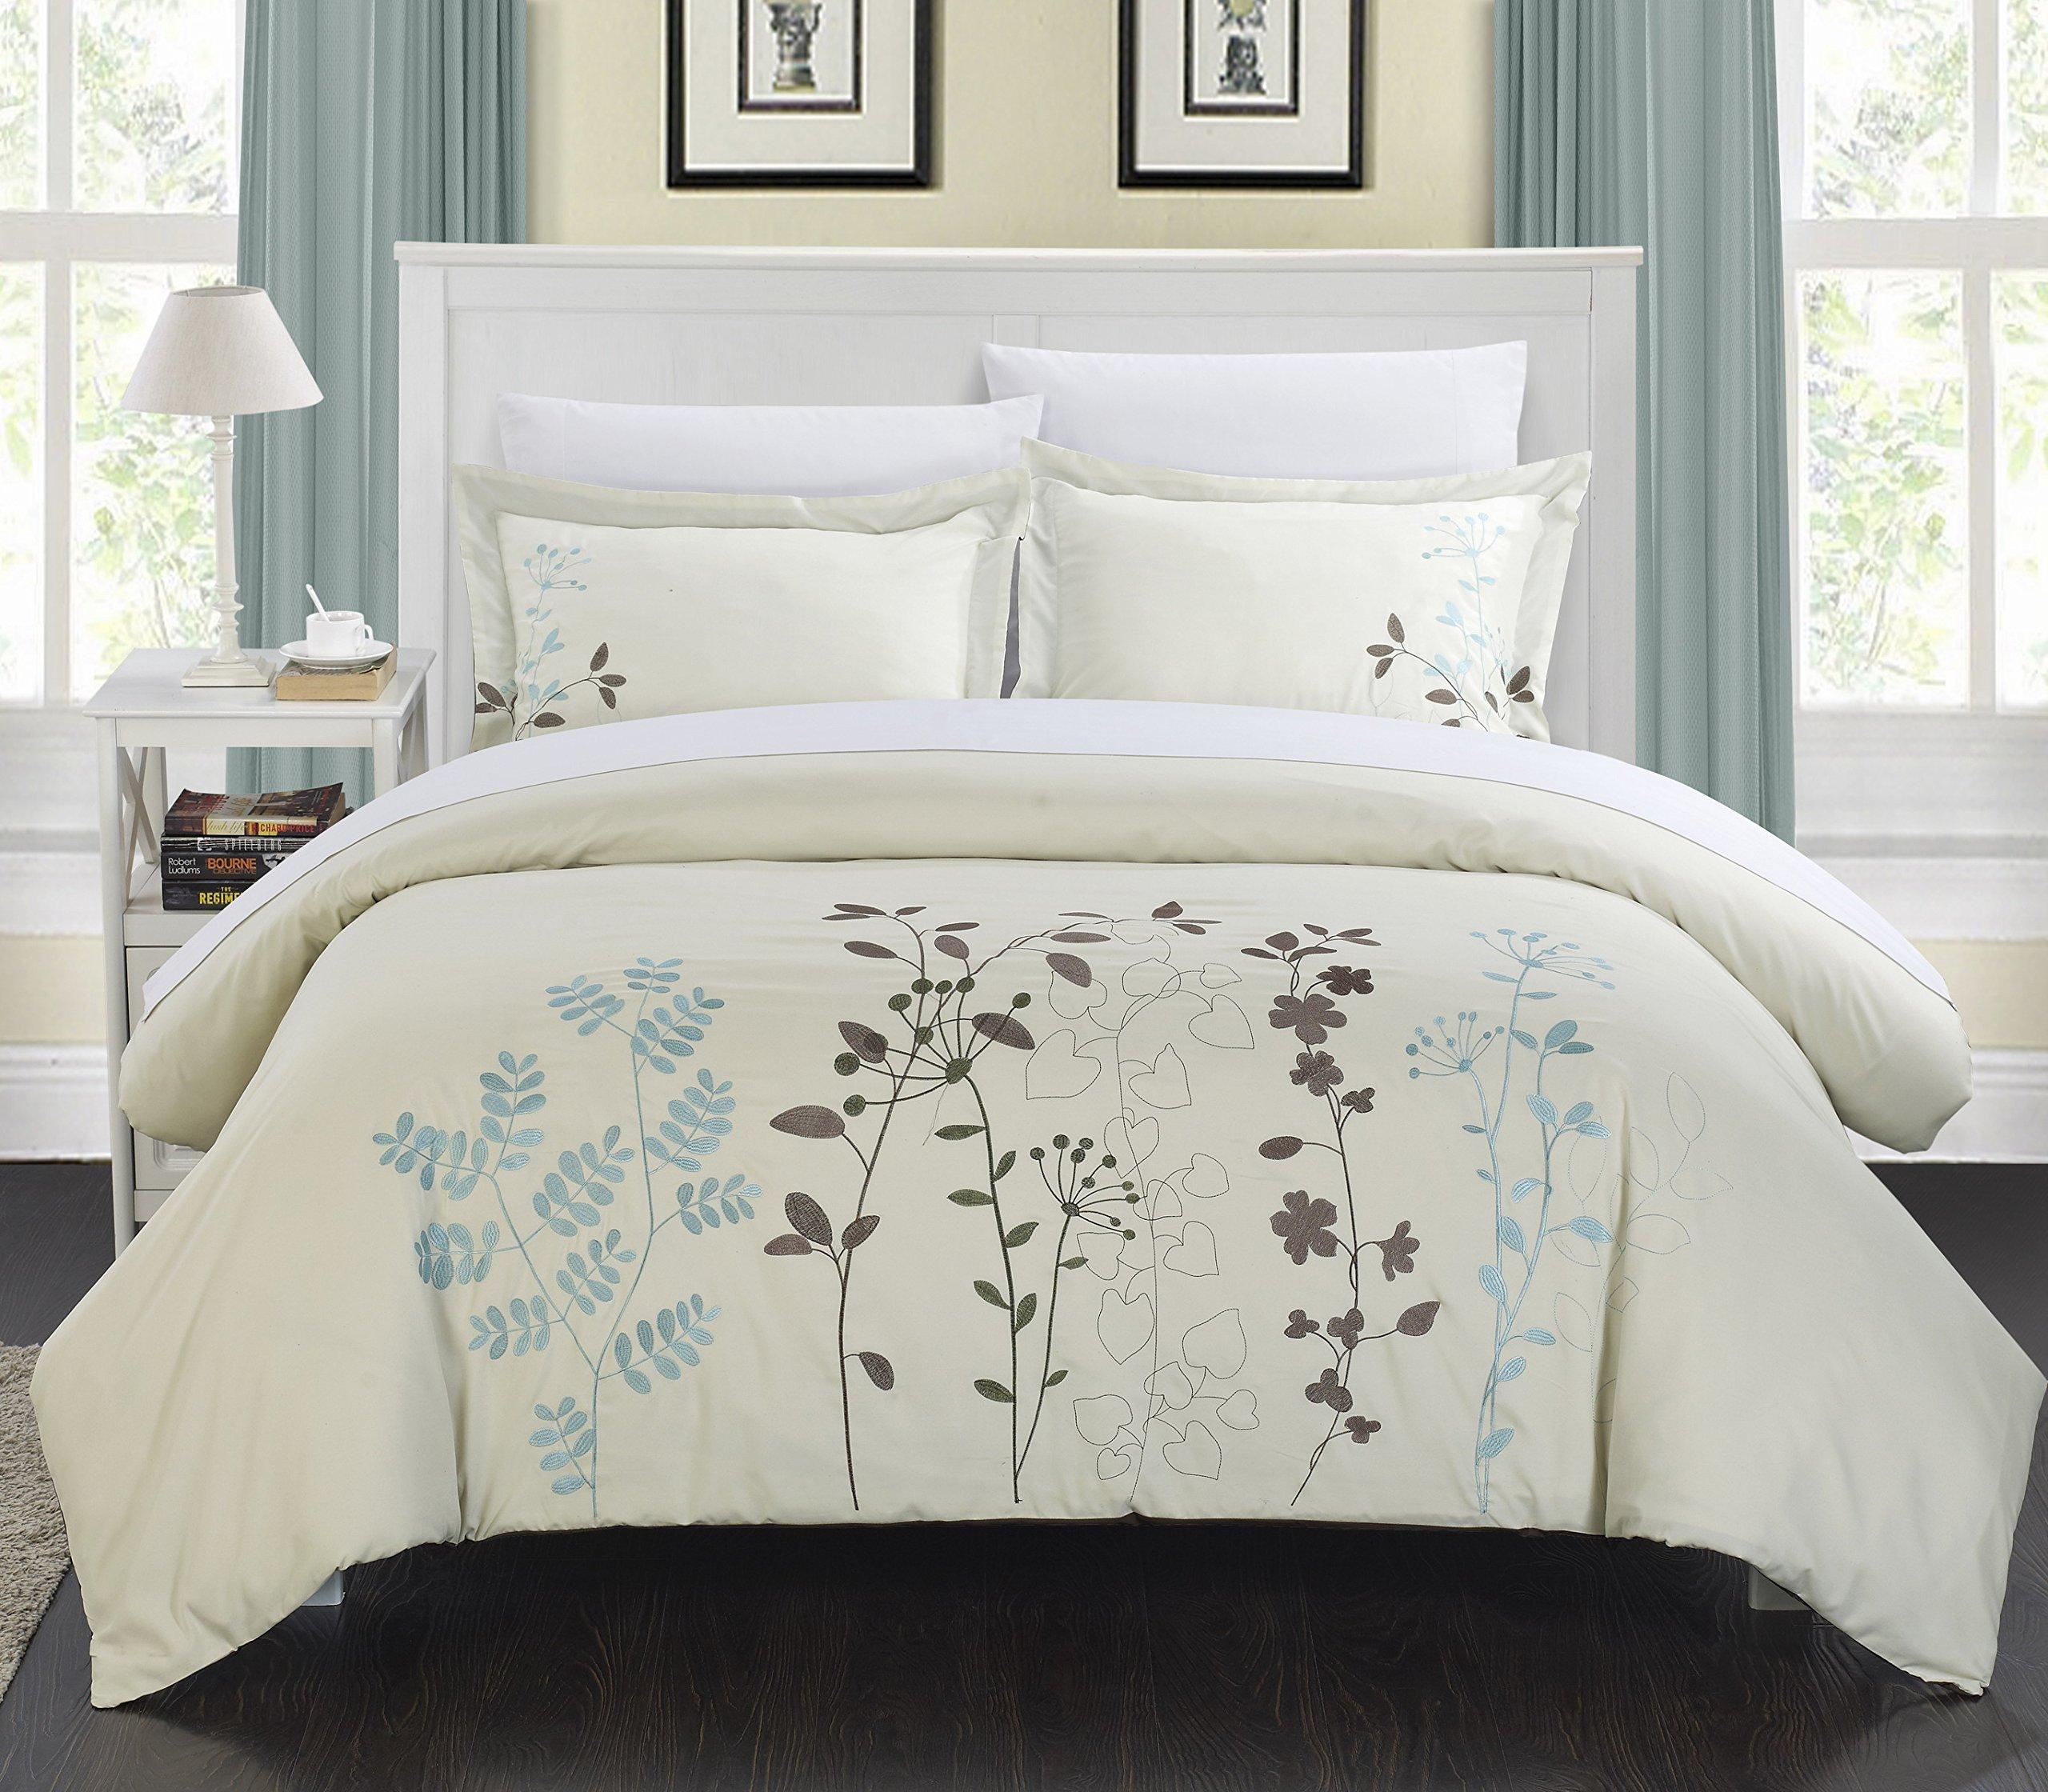 Chic Home 3-Piece Kaylee Floral Embroidered Duvet Set, Queen Beige